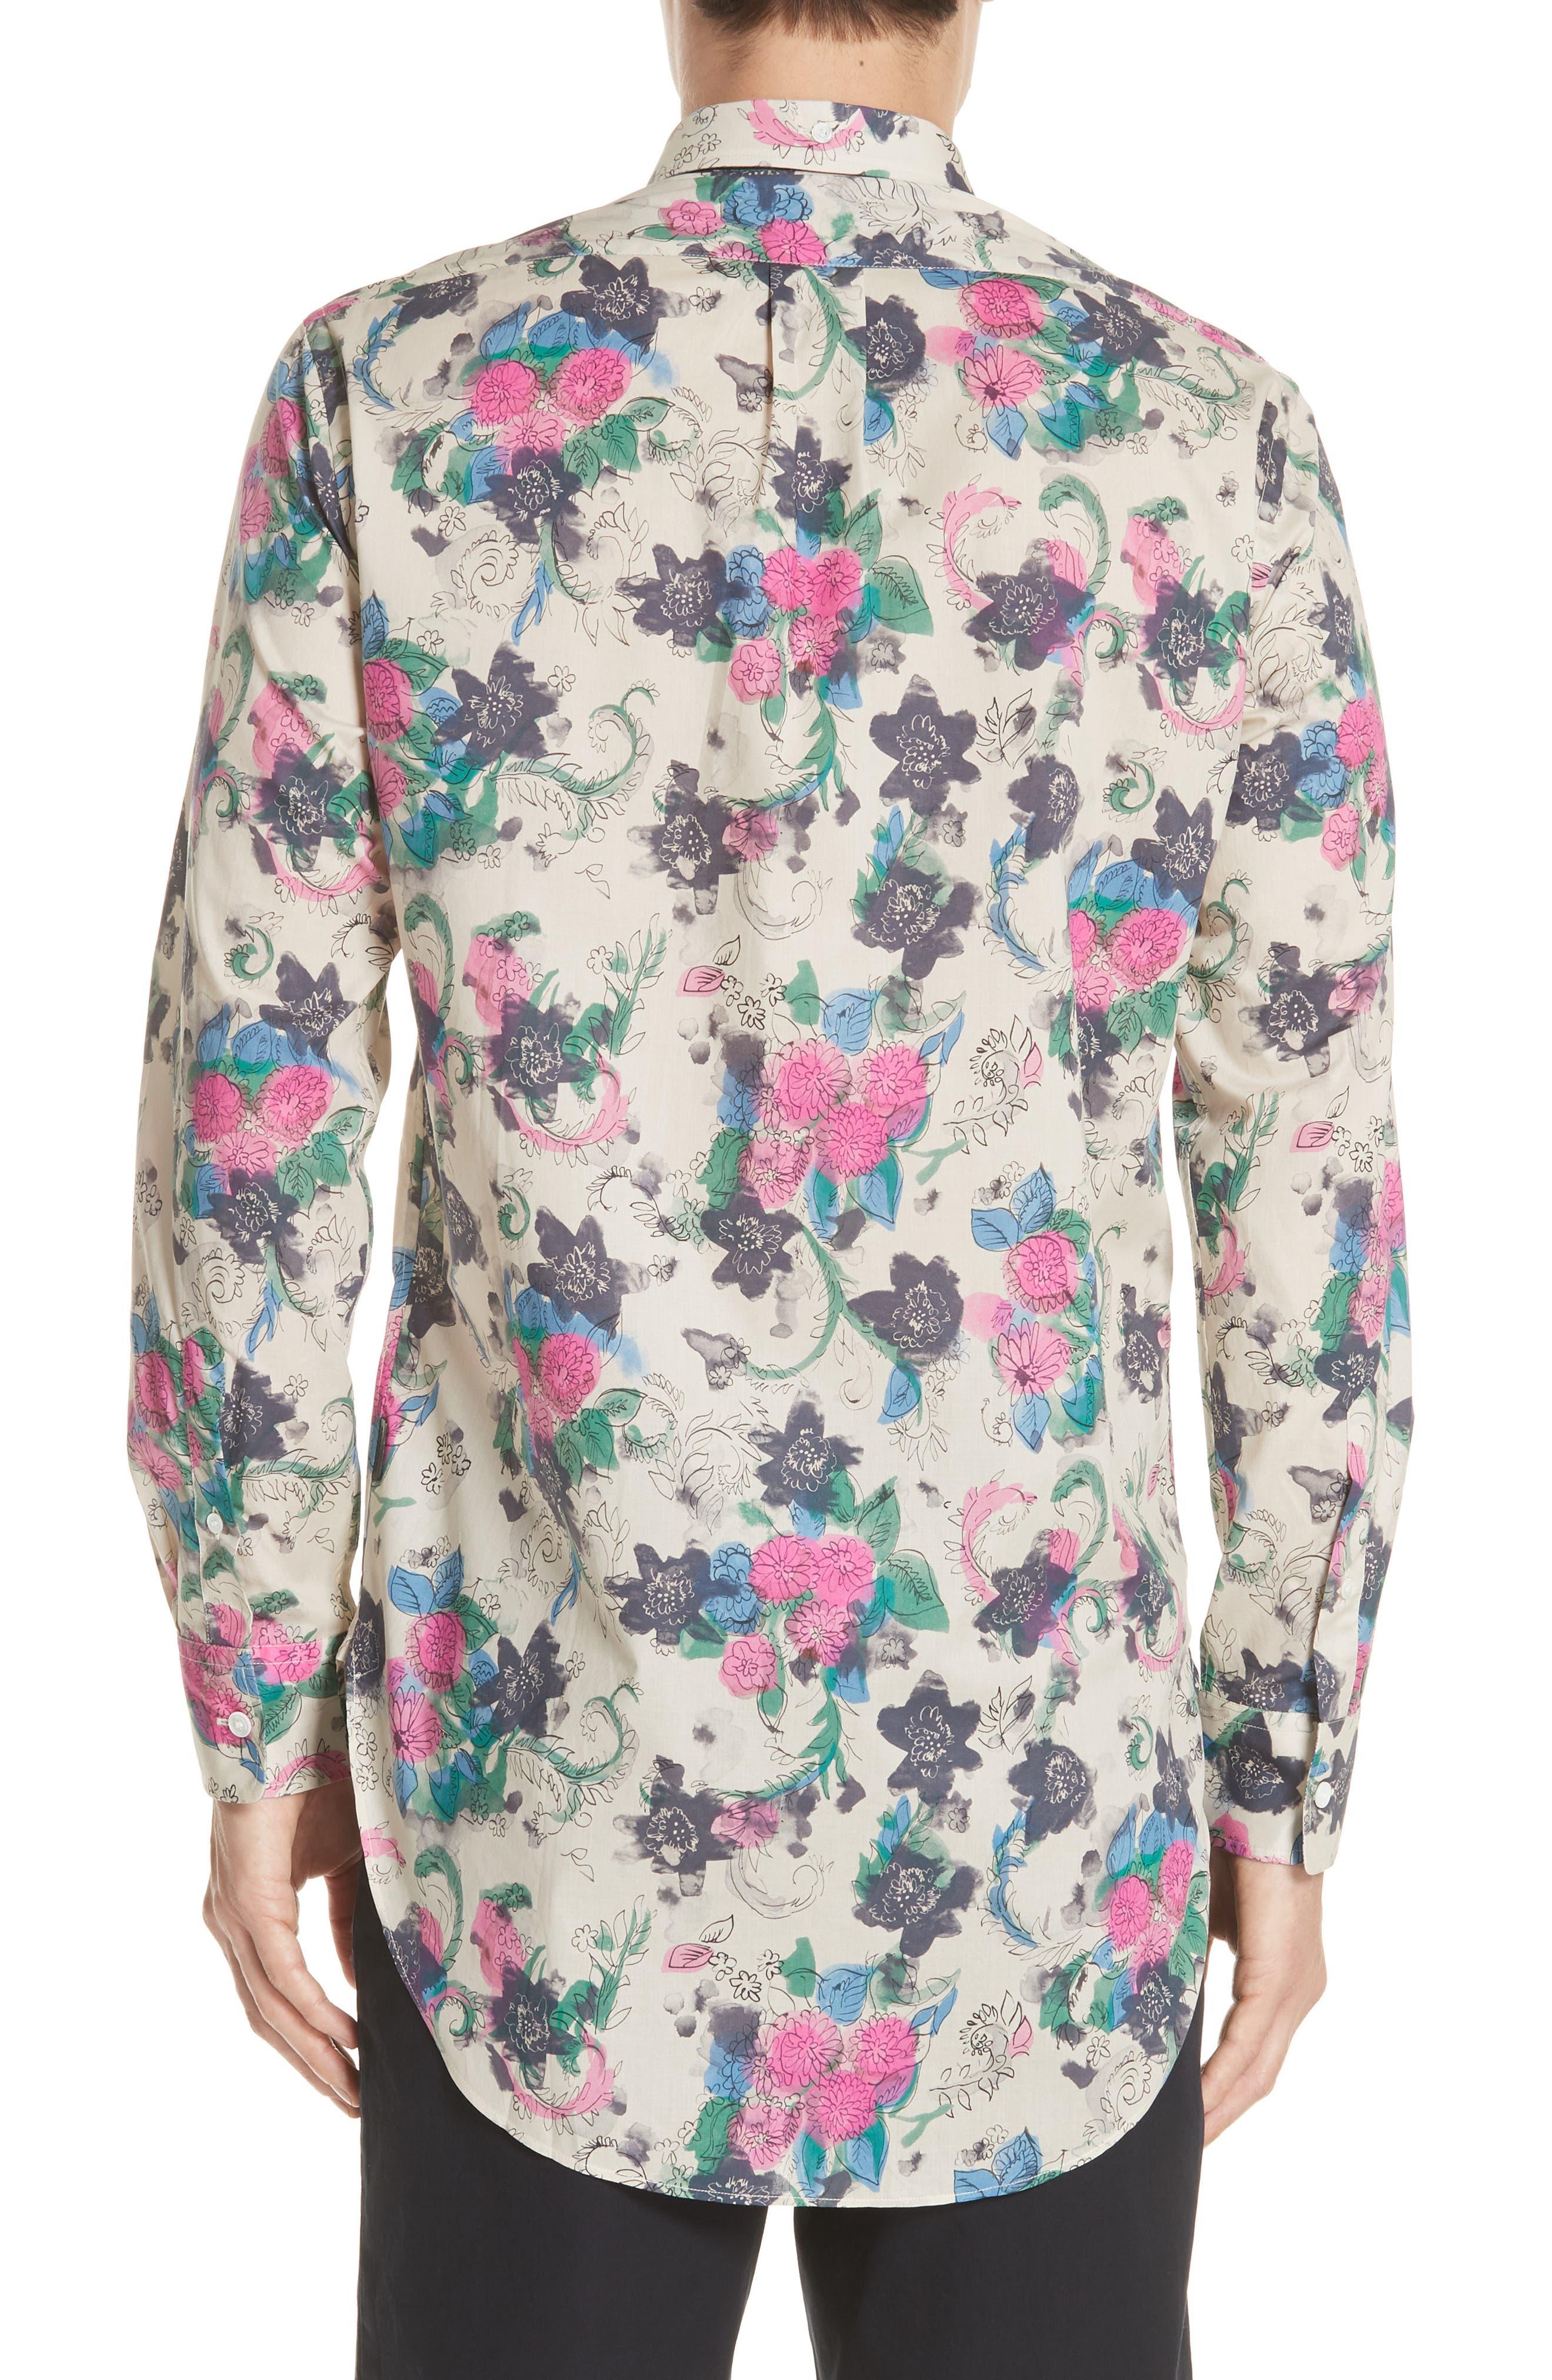 Strenton Floral Print Shirt,                             Alternate thumbnail 2, color,                             250